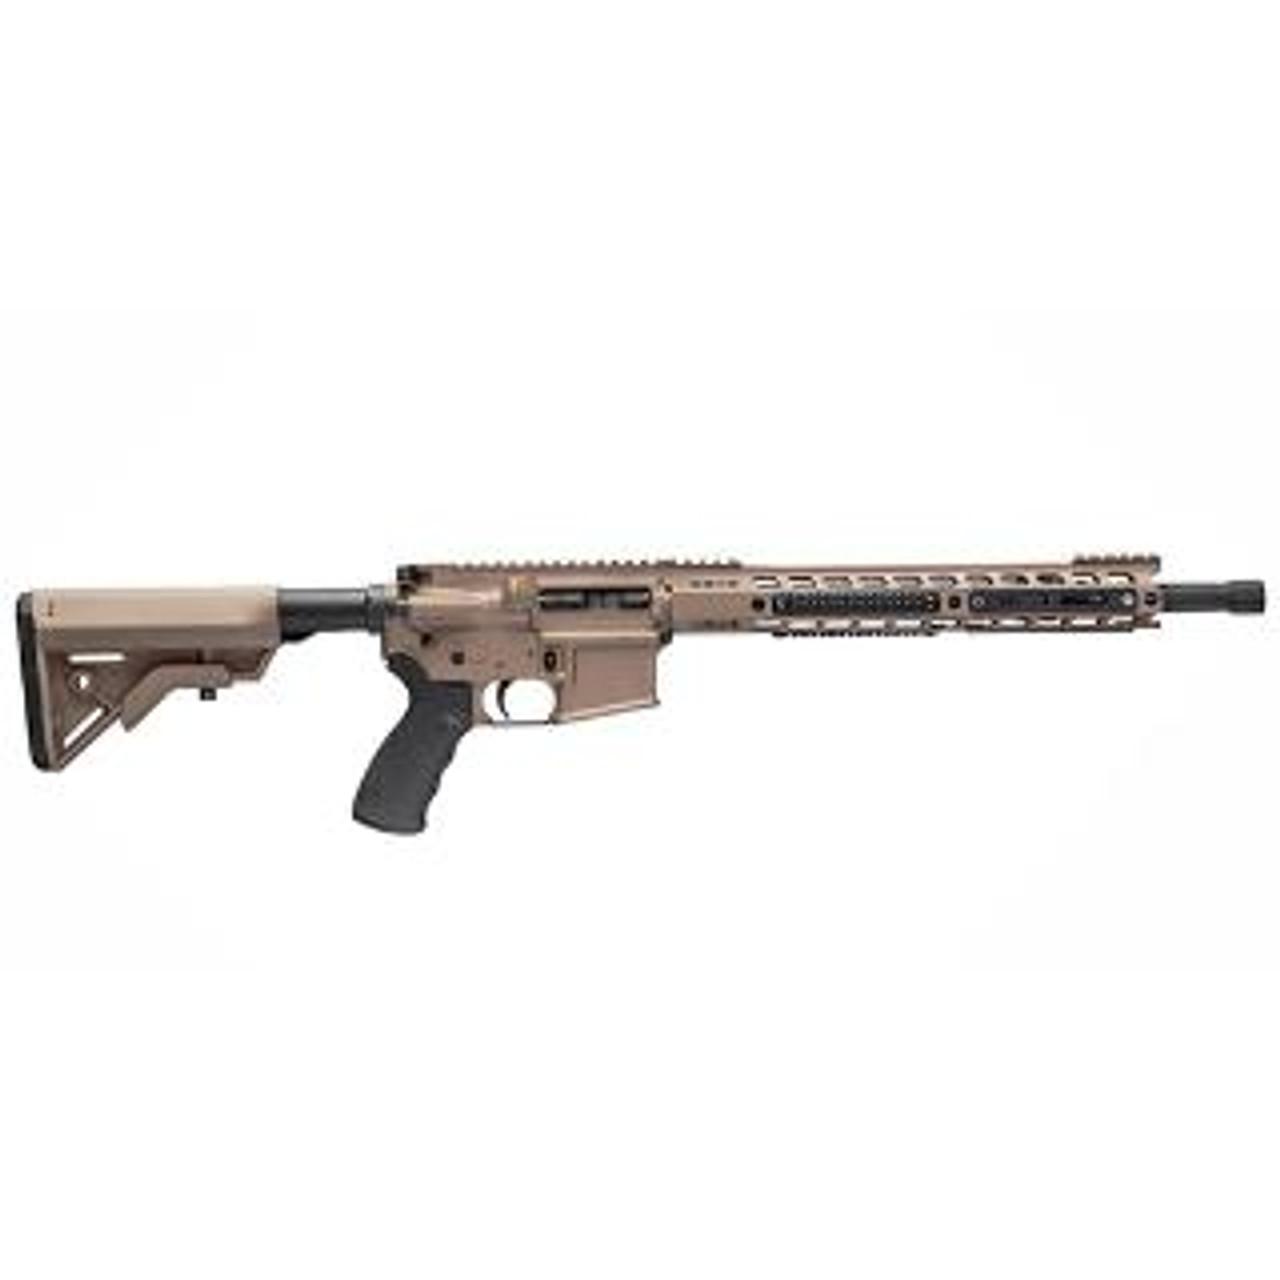 "Alexander Arms Tactical Hunter FDE 16.5"" CALIFORNIA LEGAL - .50 Beowulf®"